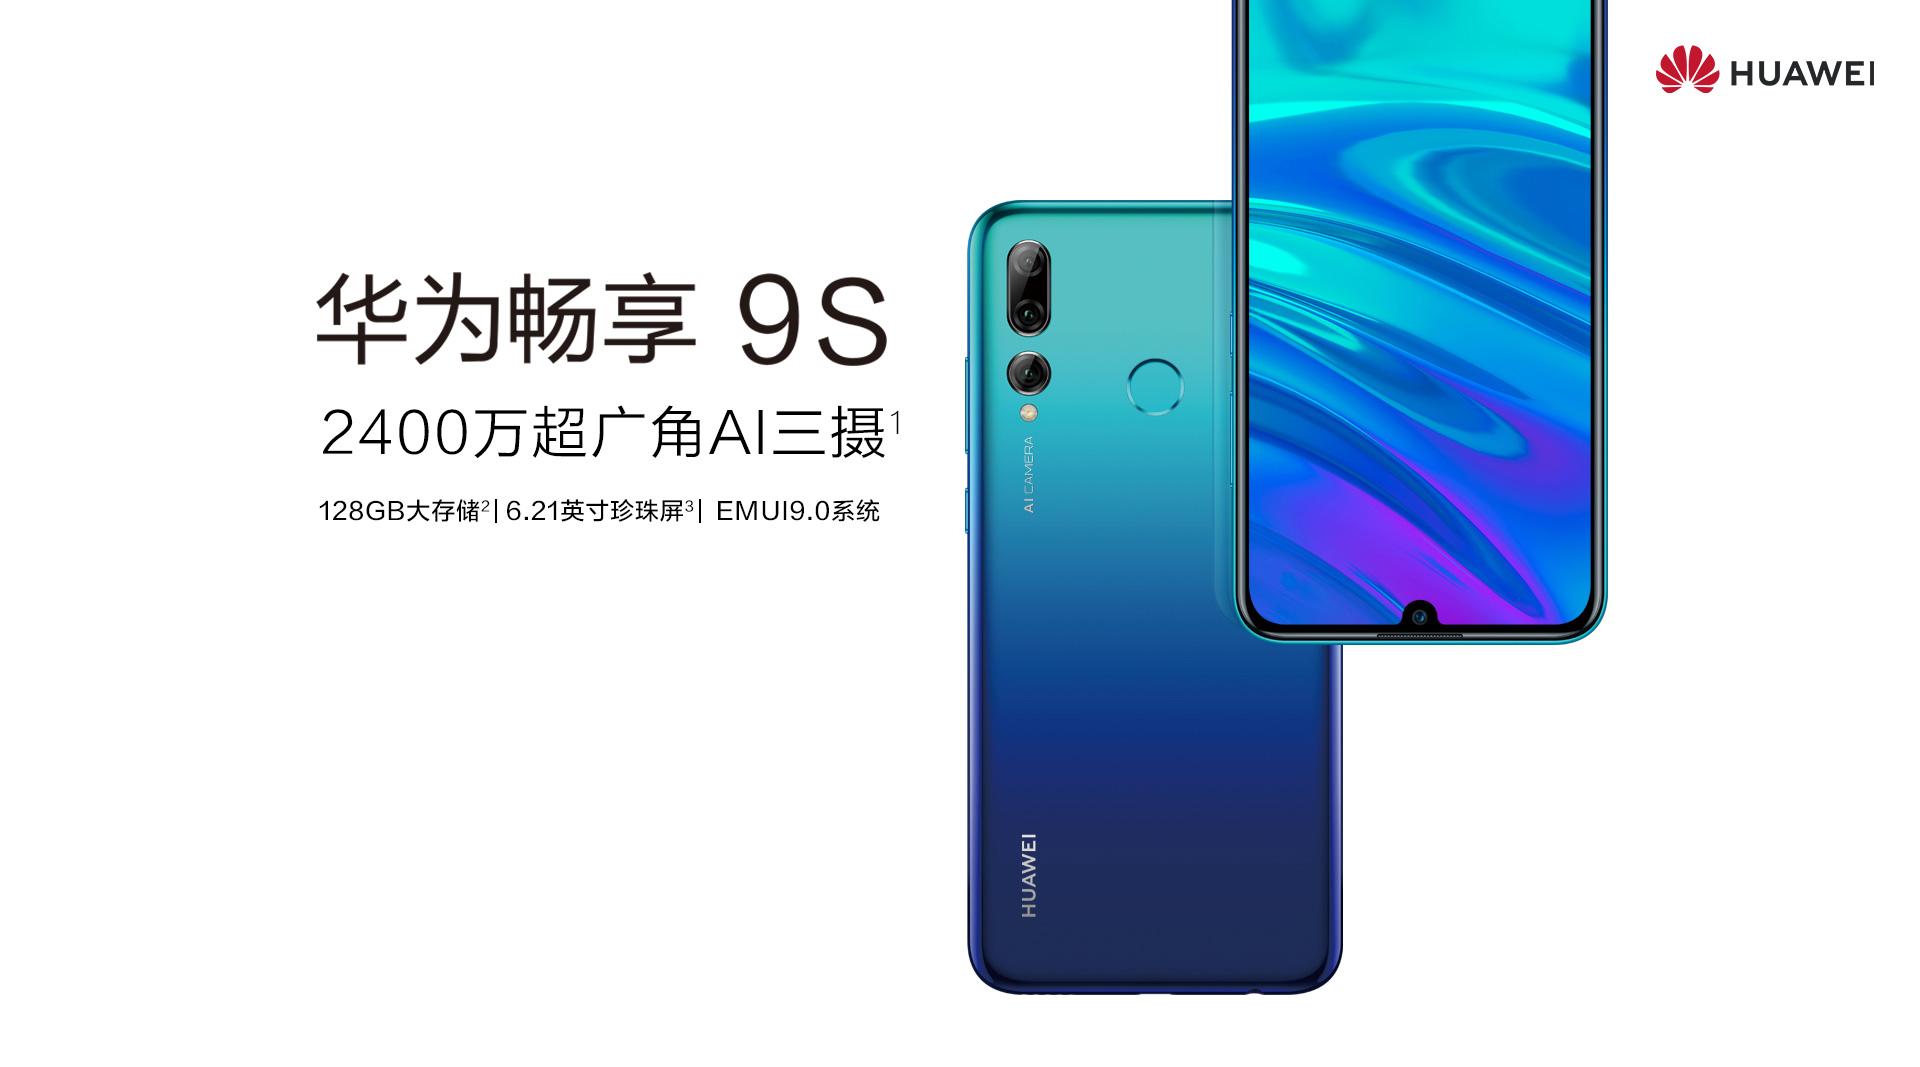 Huawei price ru http www otpbank ru